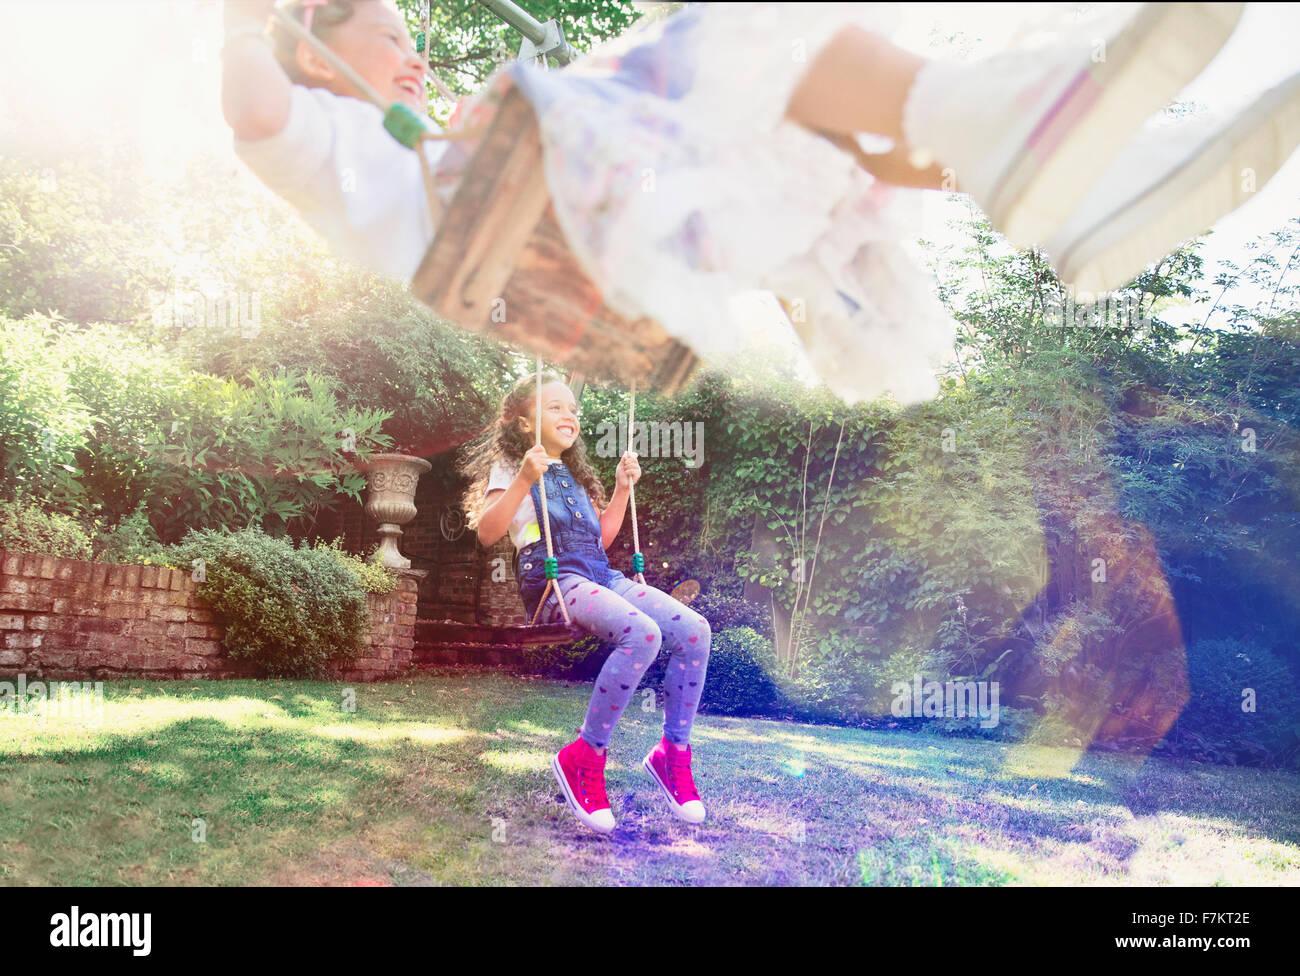 Girls swinging in backyard - Stock Image